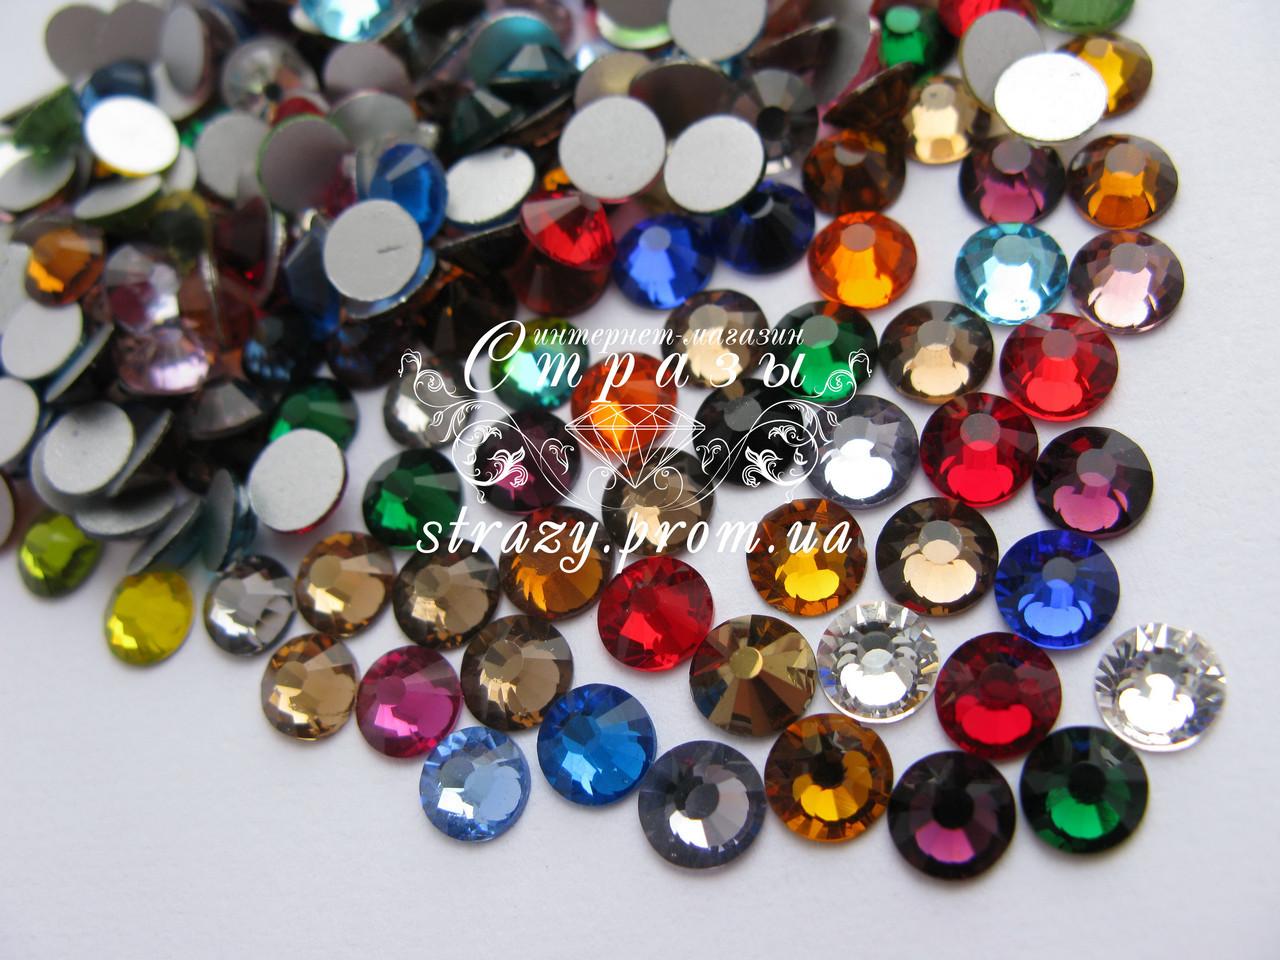 Стразы ss20 Mixed colors, 1440шт. (4,6-4,8мм)